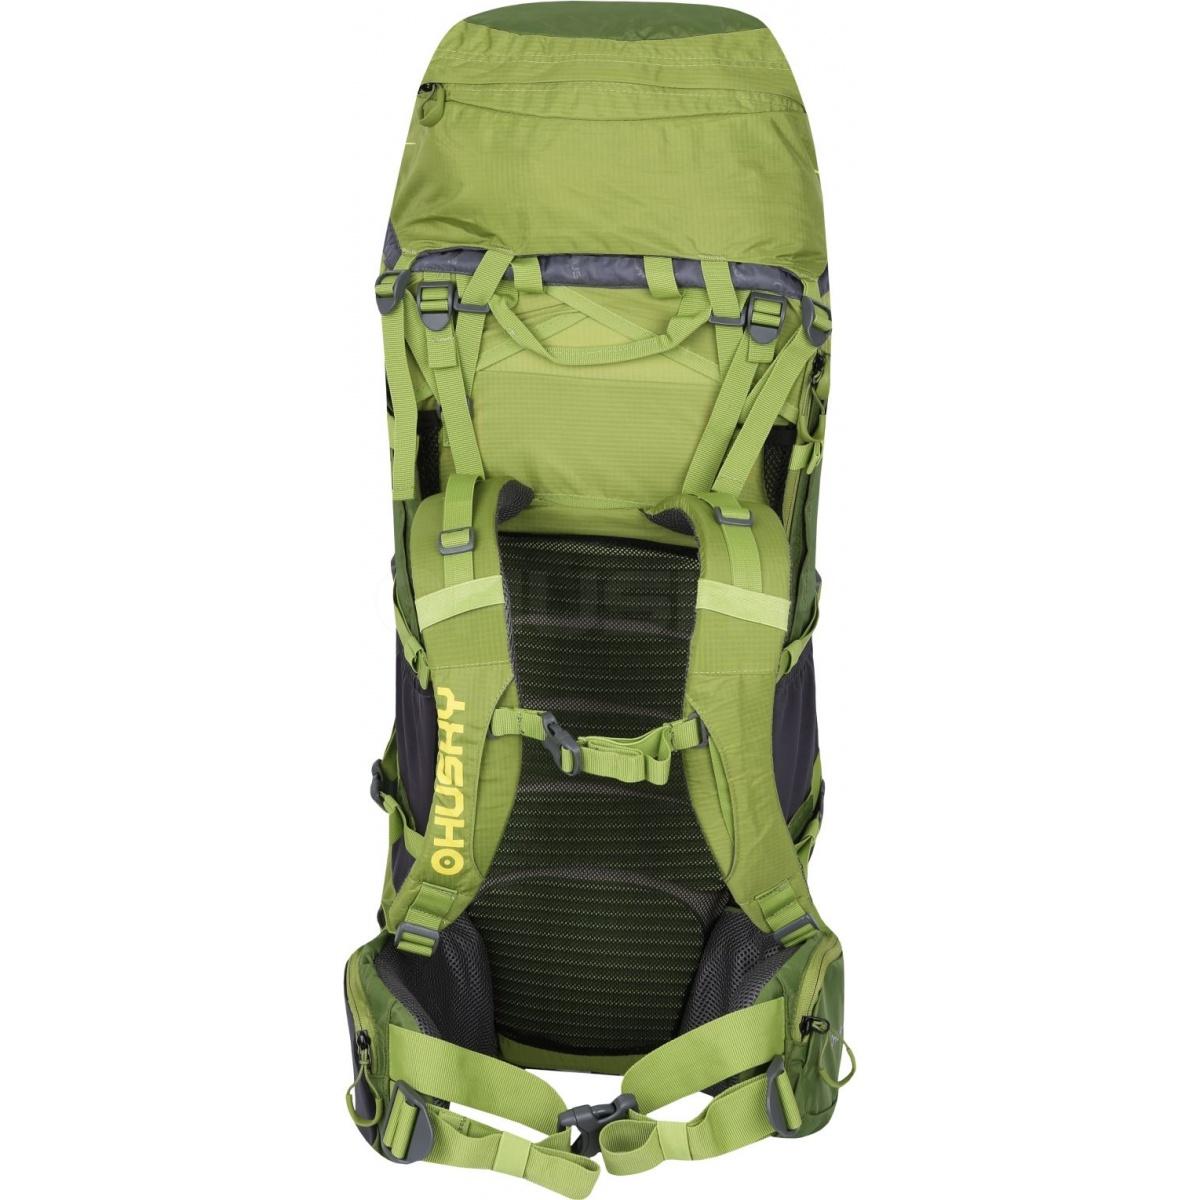 0c52b32f5b Batoh Ultralight - Ribon 60l – zelená